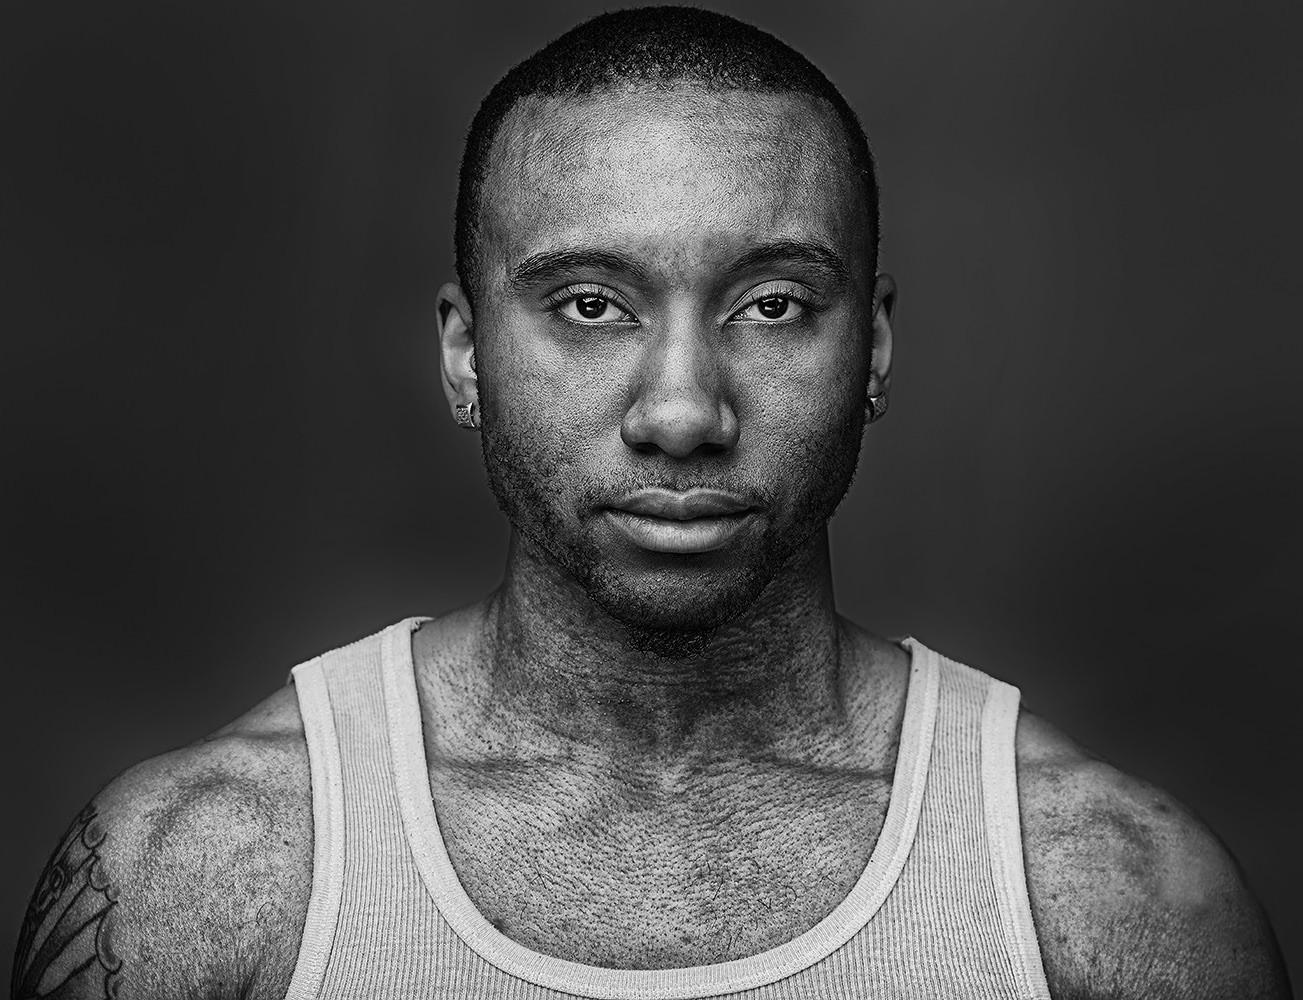 Chicago Portrait Photographer